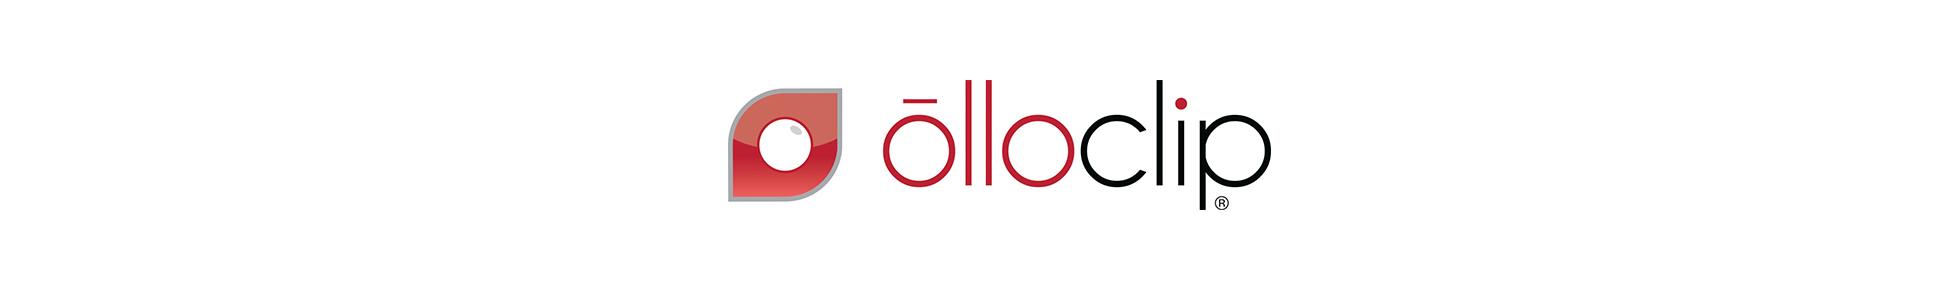 olloclip logo.jpg